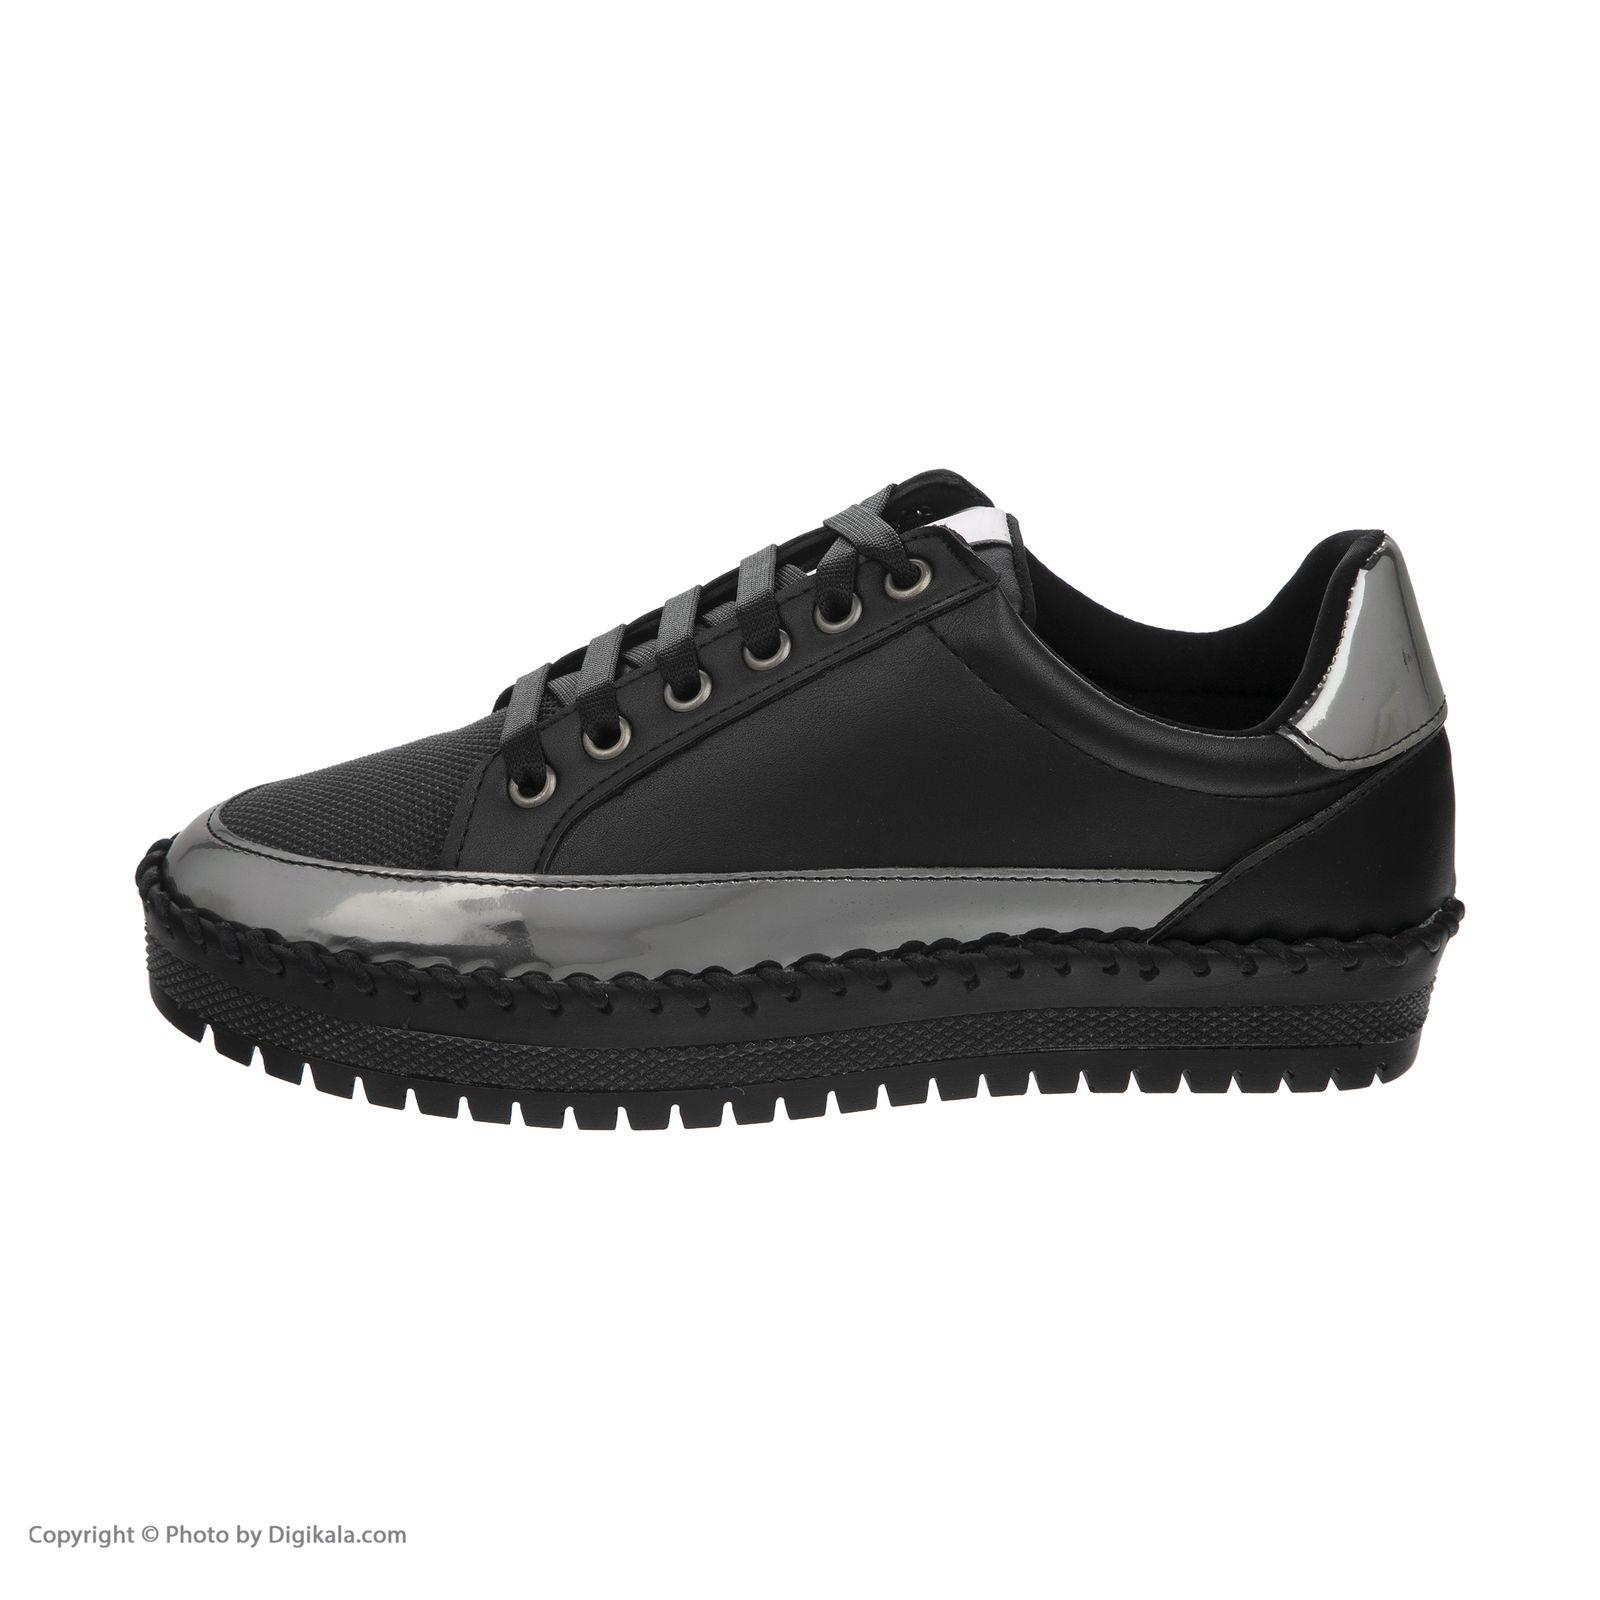 کفش روزمره زنانه ام تو مدل 99-1005 main 1 1